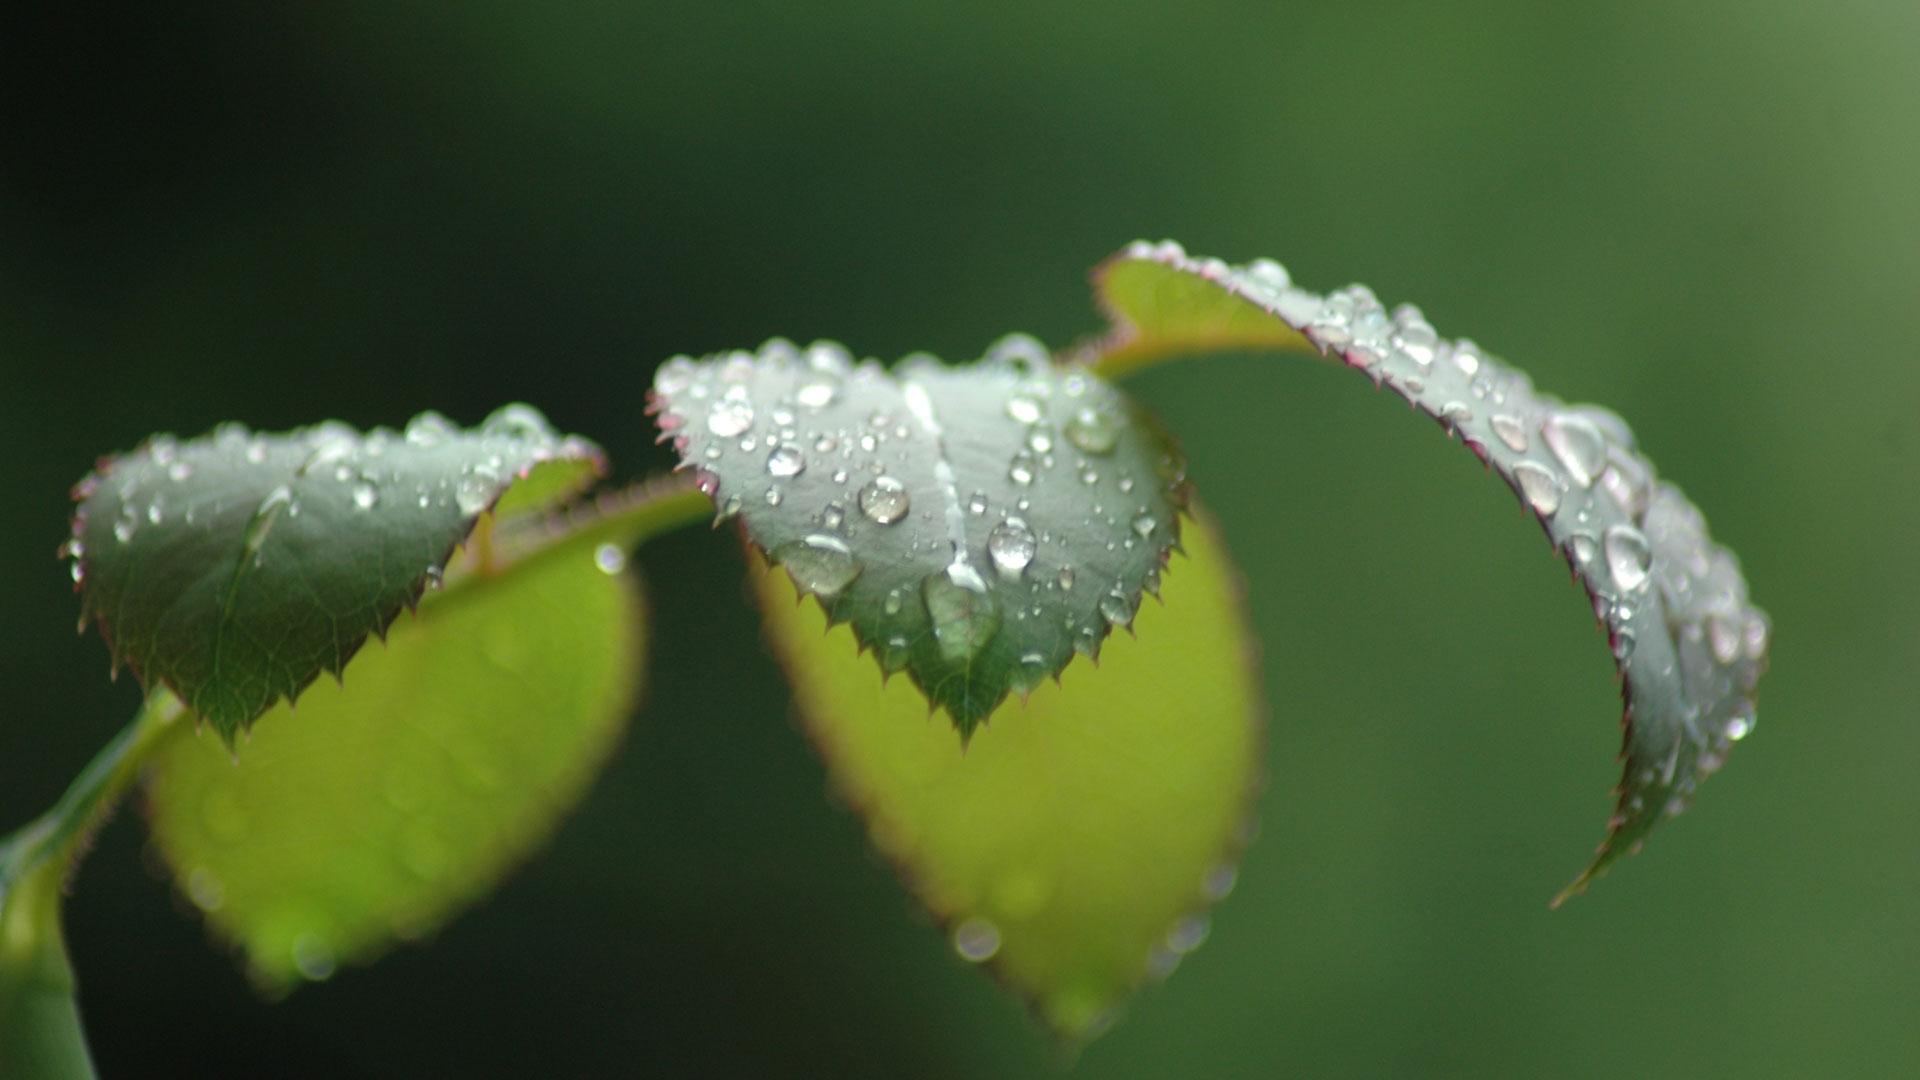 Rain Wallpapers With Quotes Hd Rain On Leaves Wallpaper Hd Pixelstalk Net